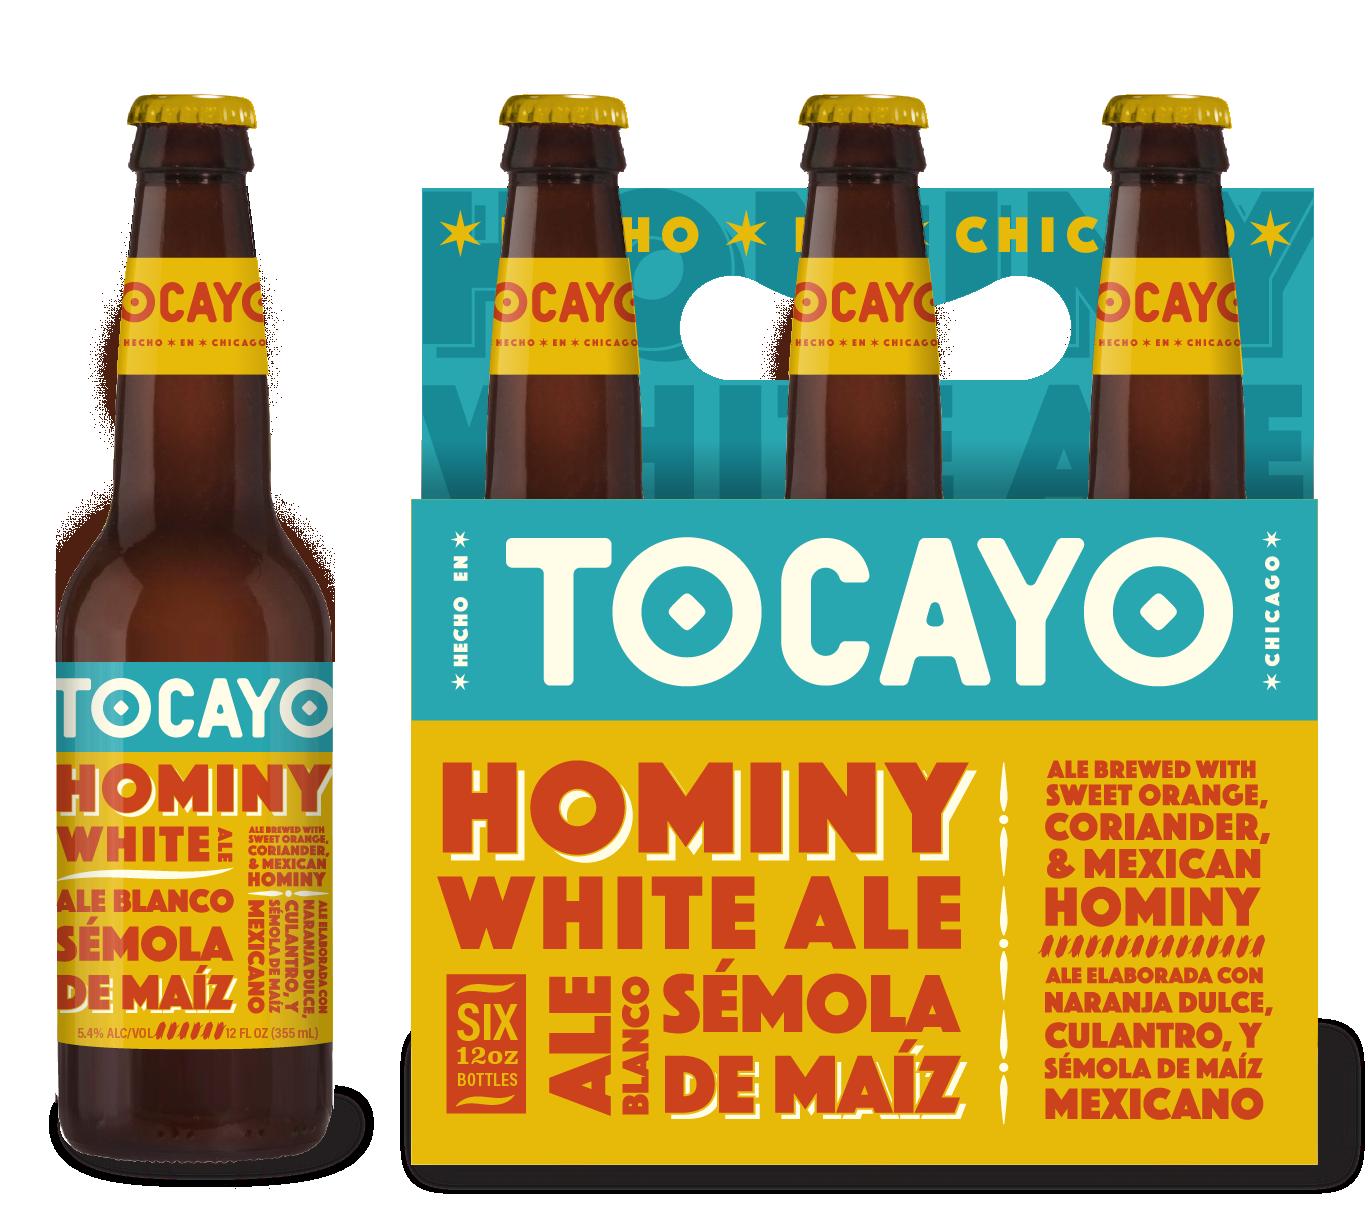 TocayoArtboard 1 copy.png